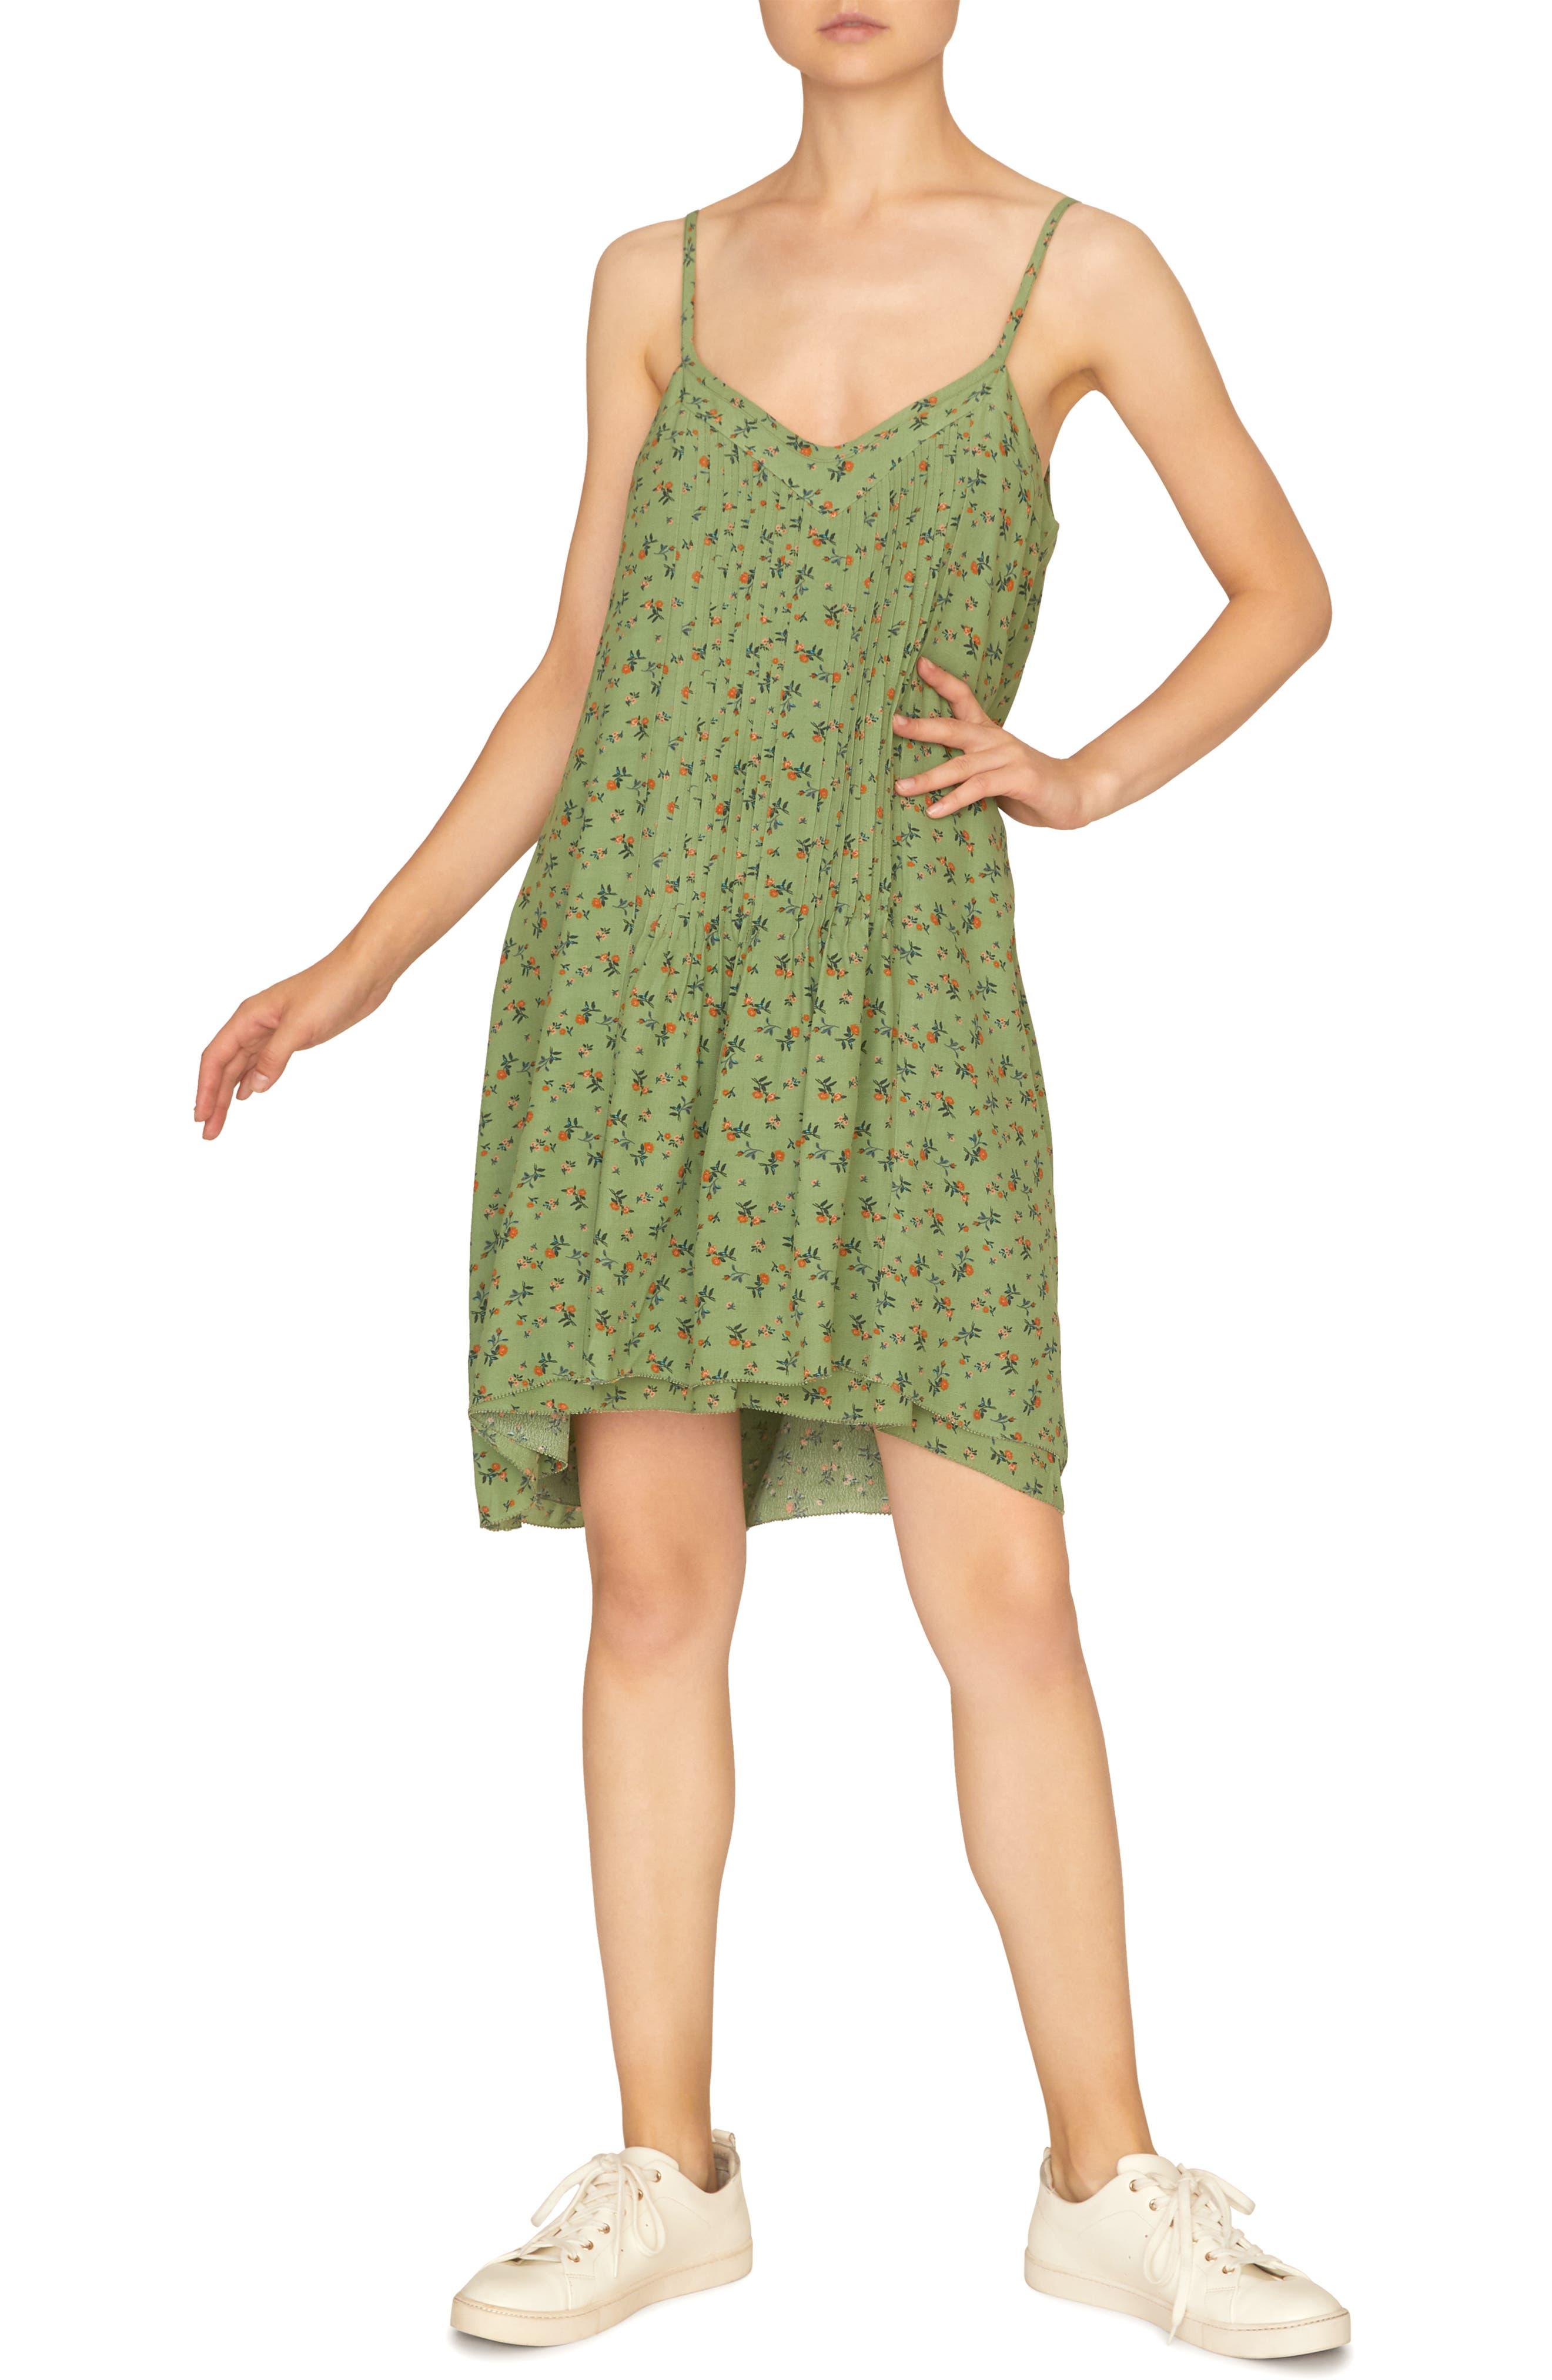 Petite Sanctuary Spring Ahead Tank Dress, Green